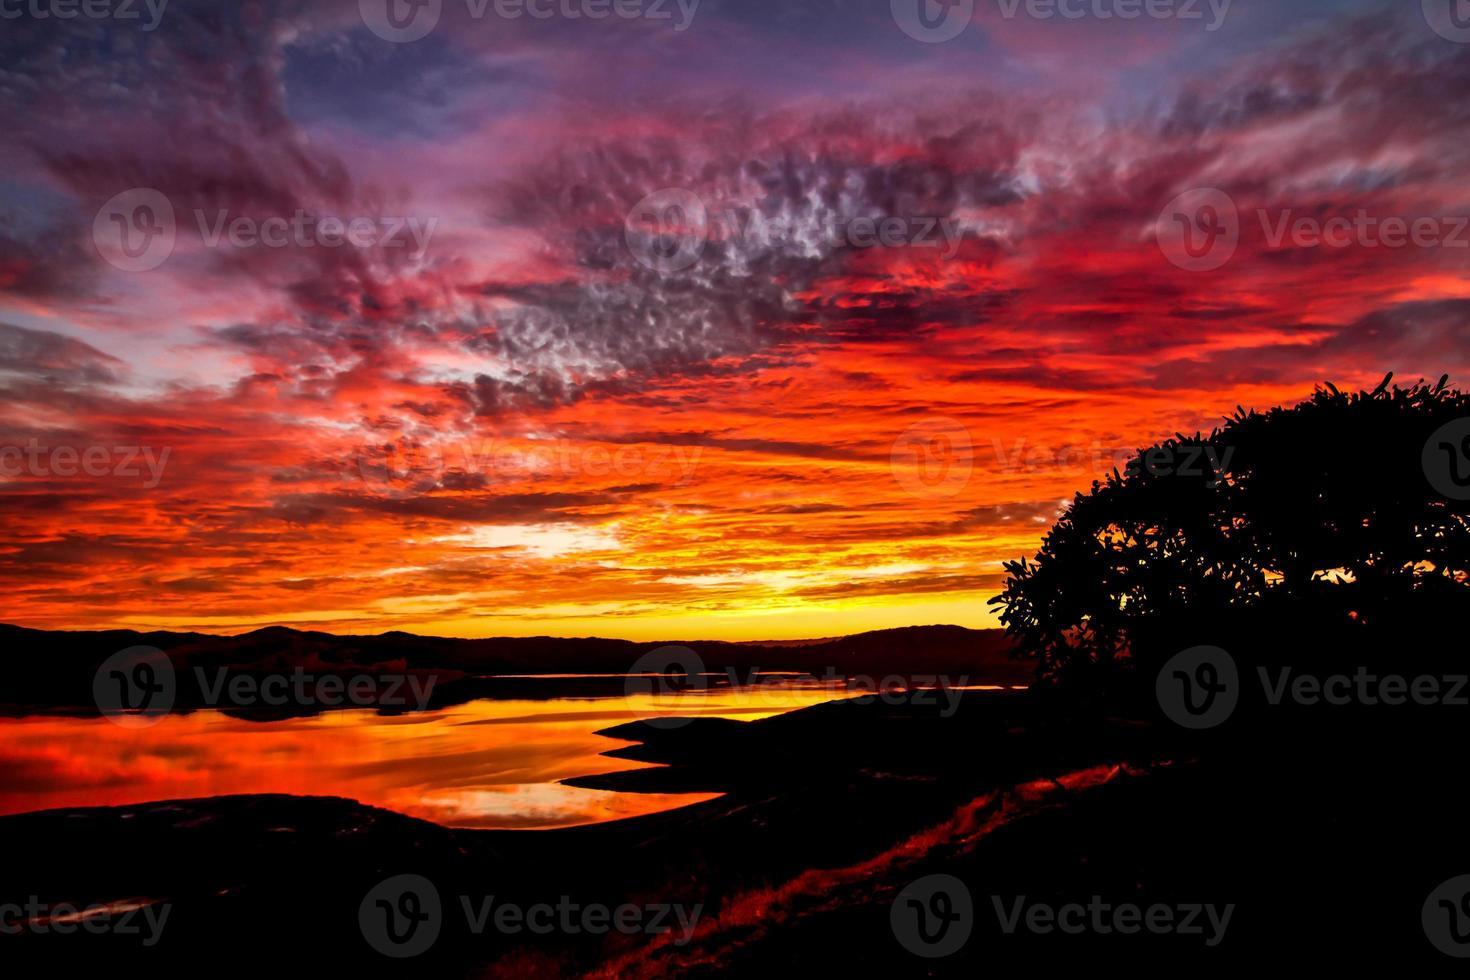 tramonto riflesso foto